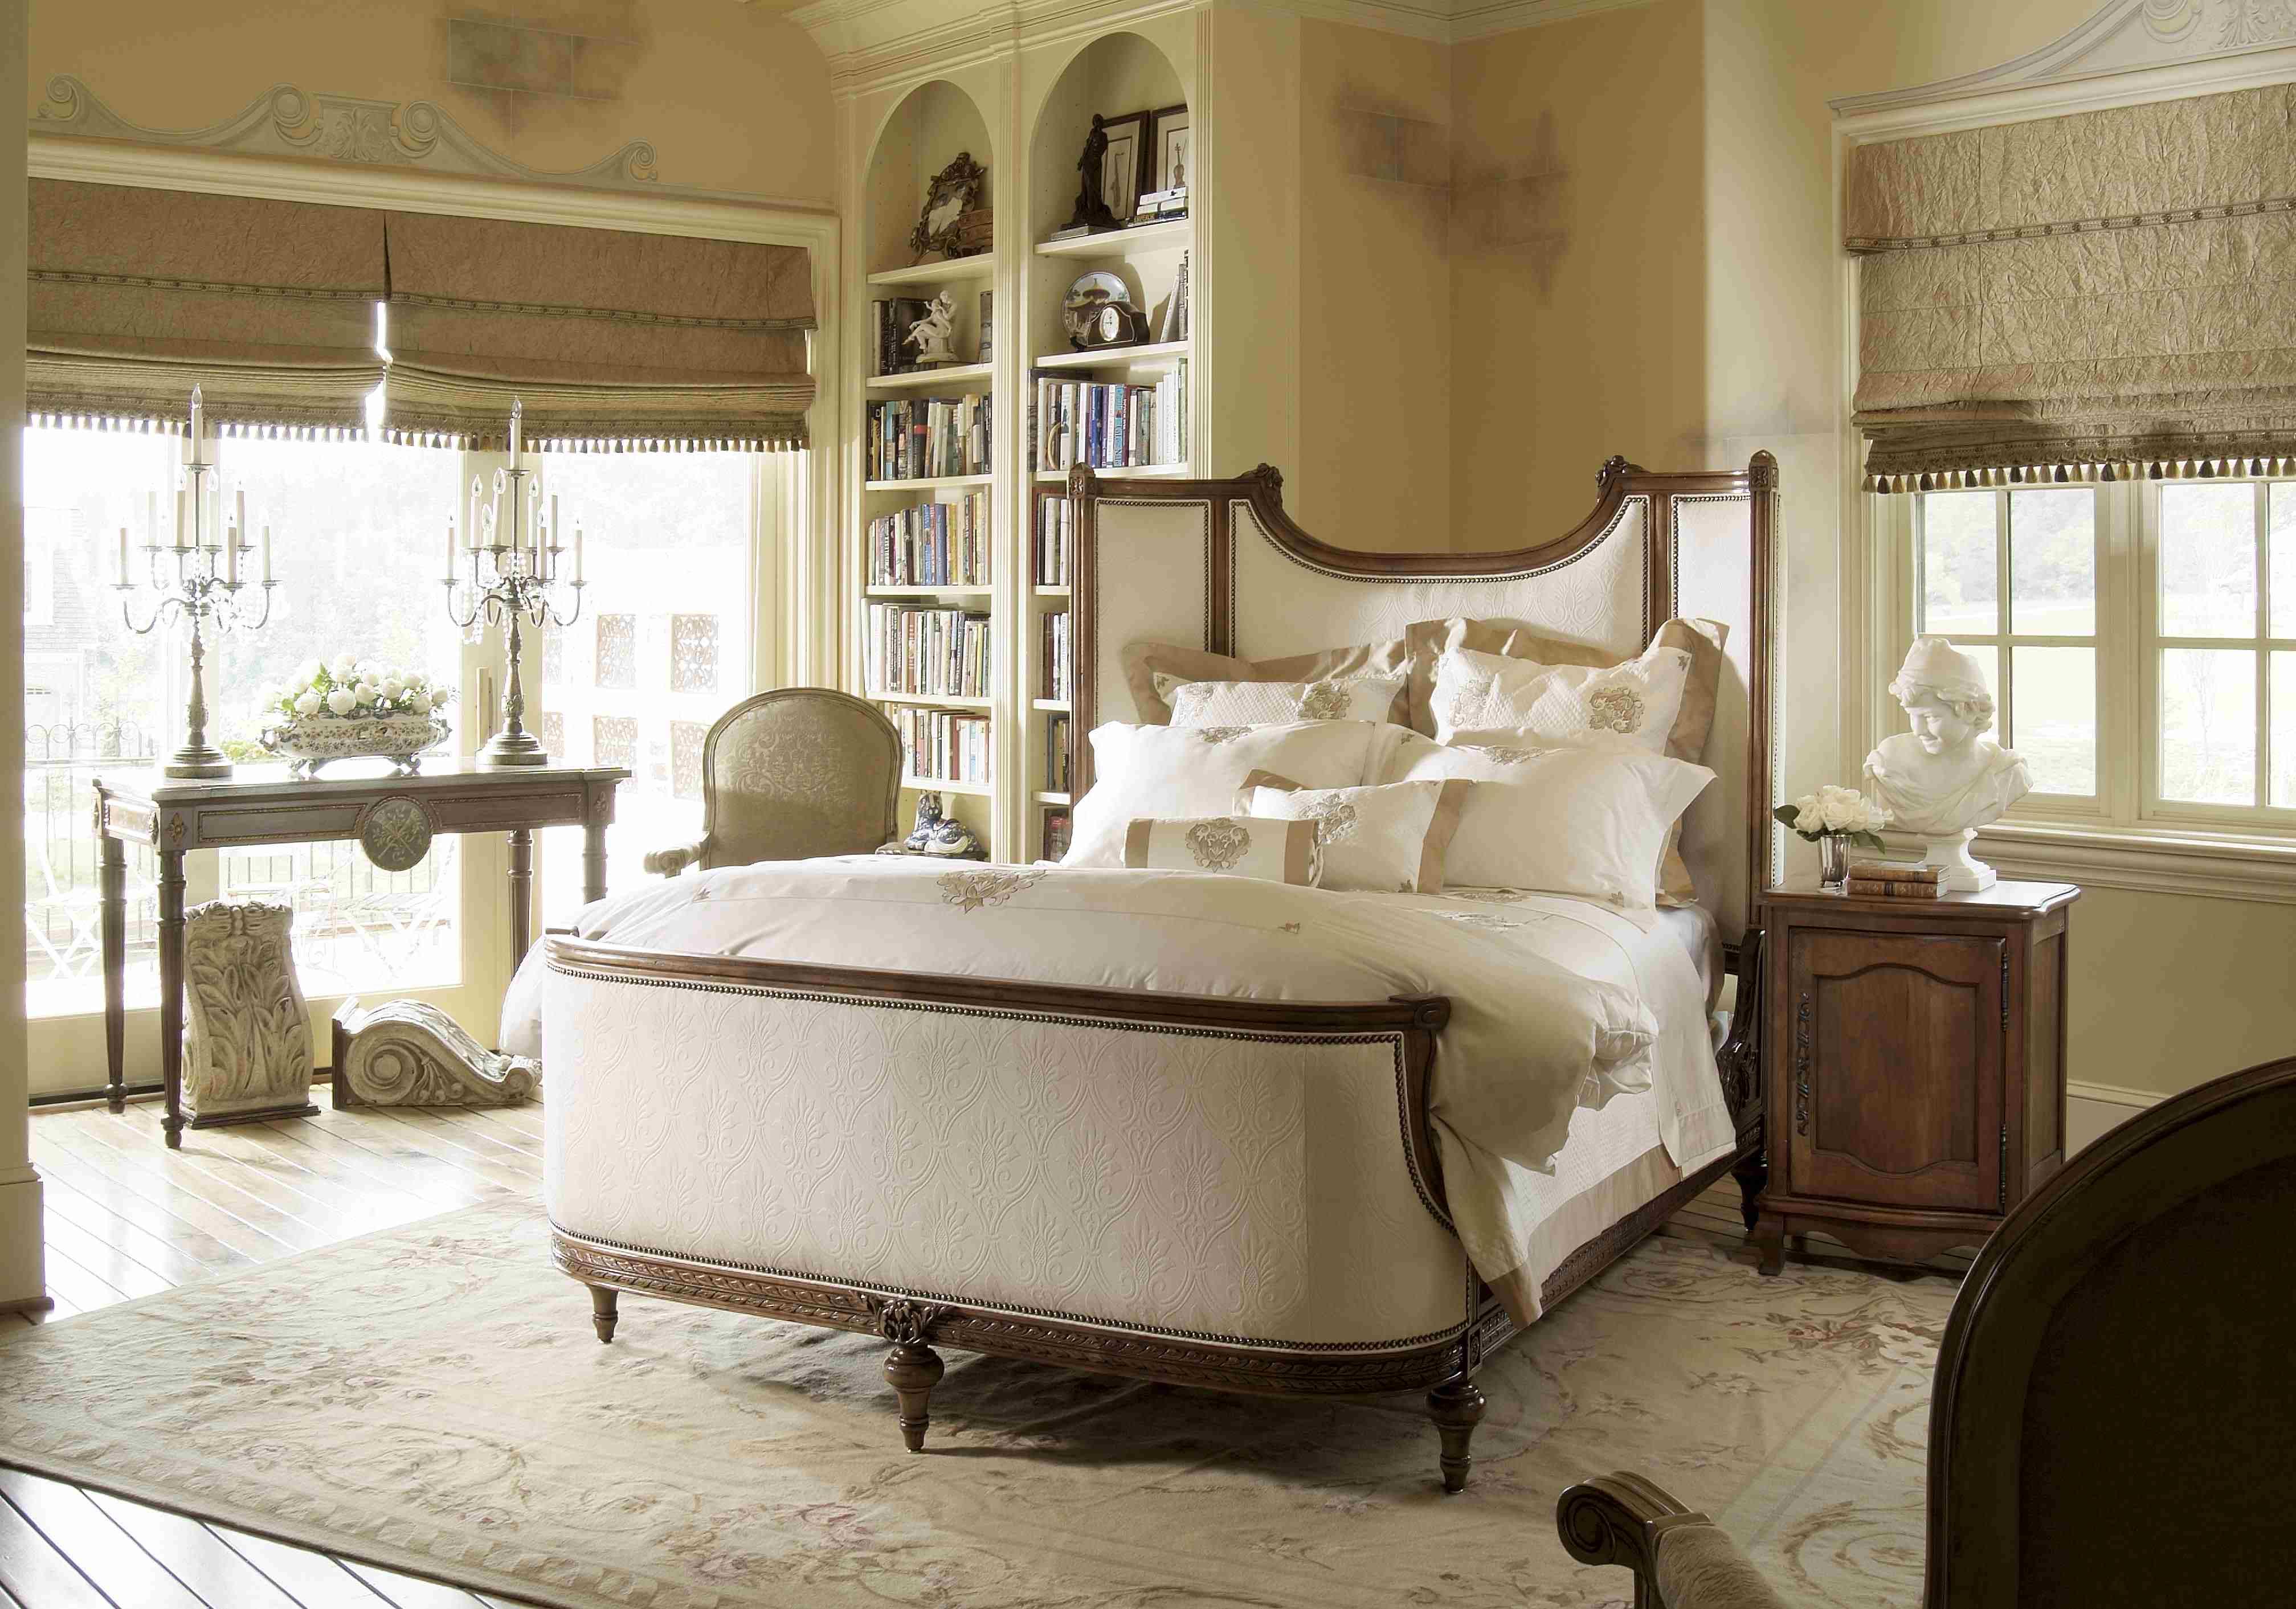 salem beds bed placement - Bedroom Placement Ideas